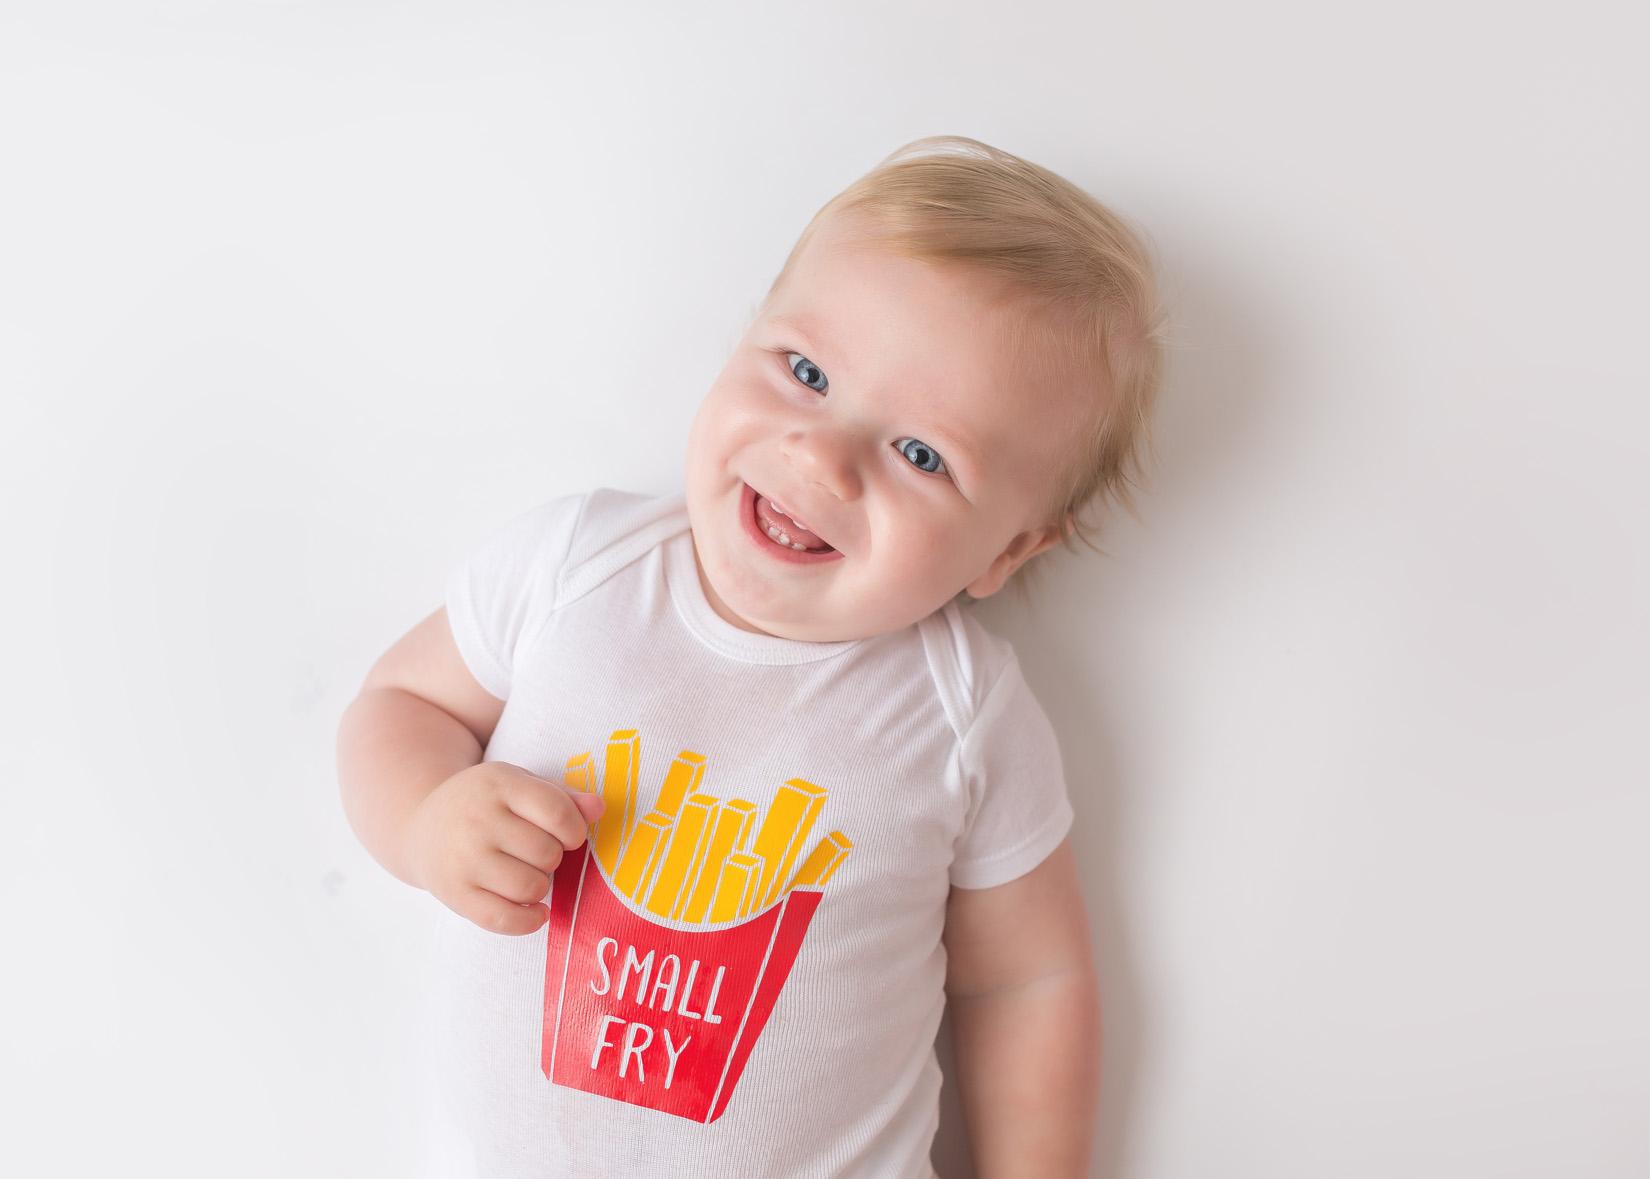 Small Fry 039.jpg